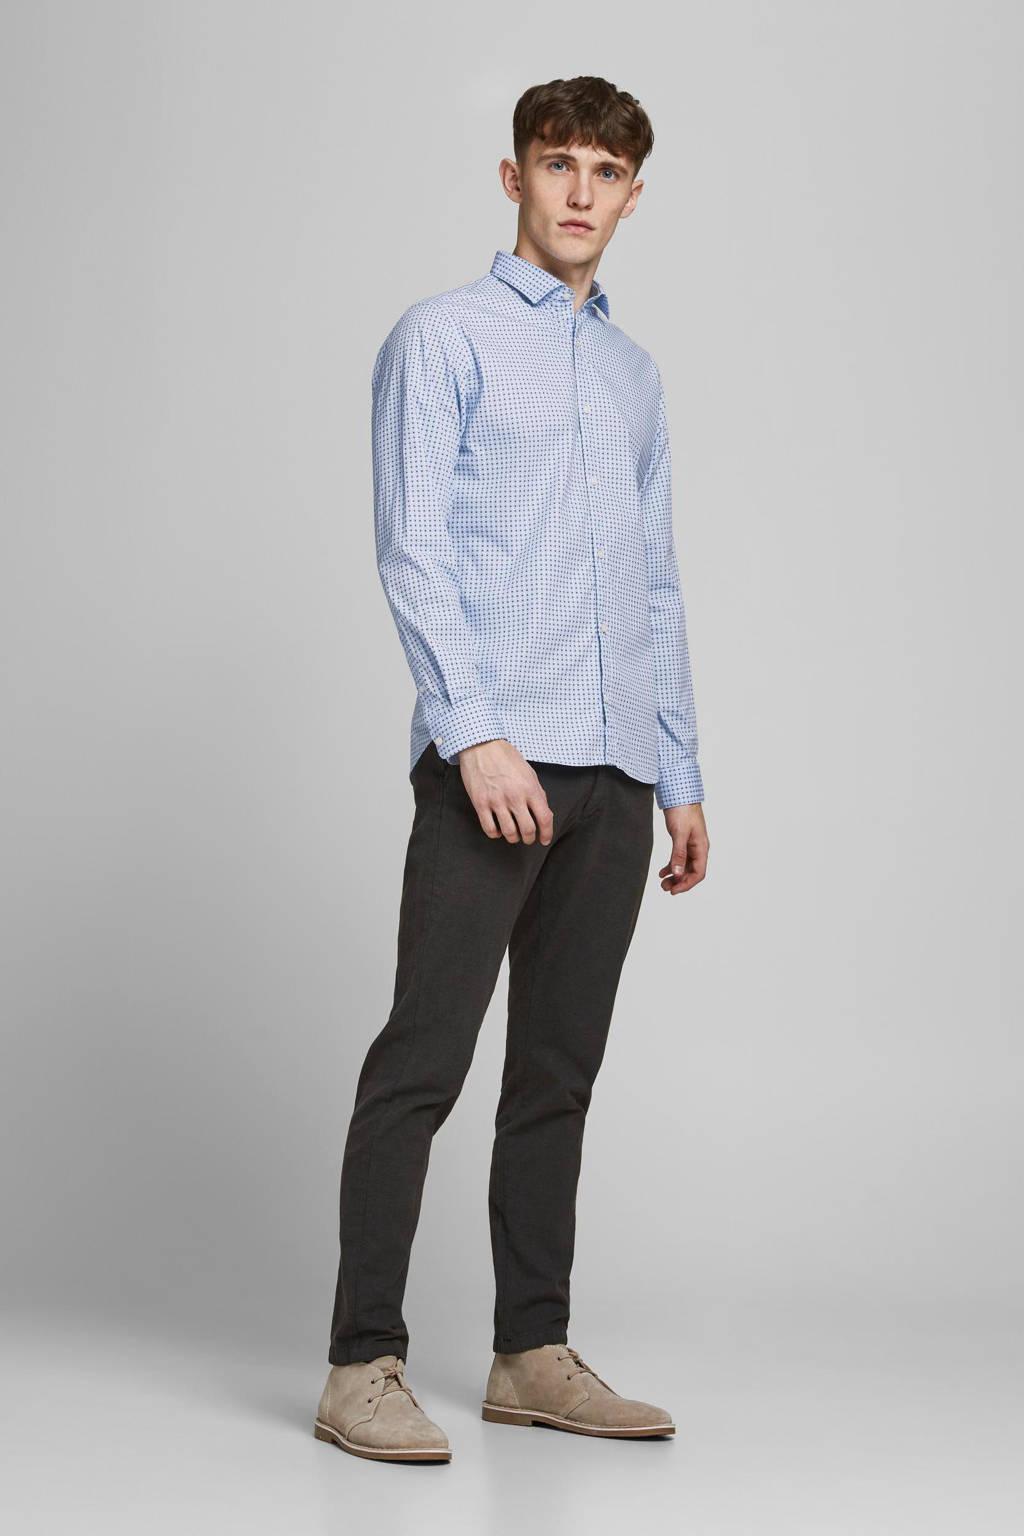 JACK & JONES PREMIUM slim fit overhemd met all over print lichtblauw, Lichtblauw